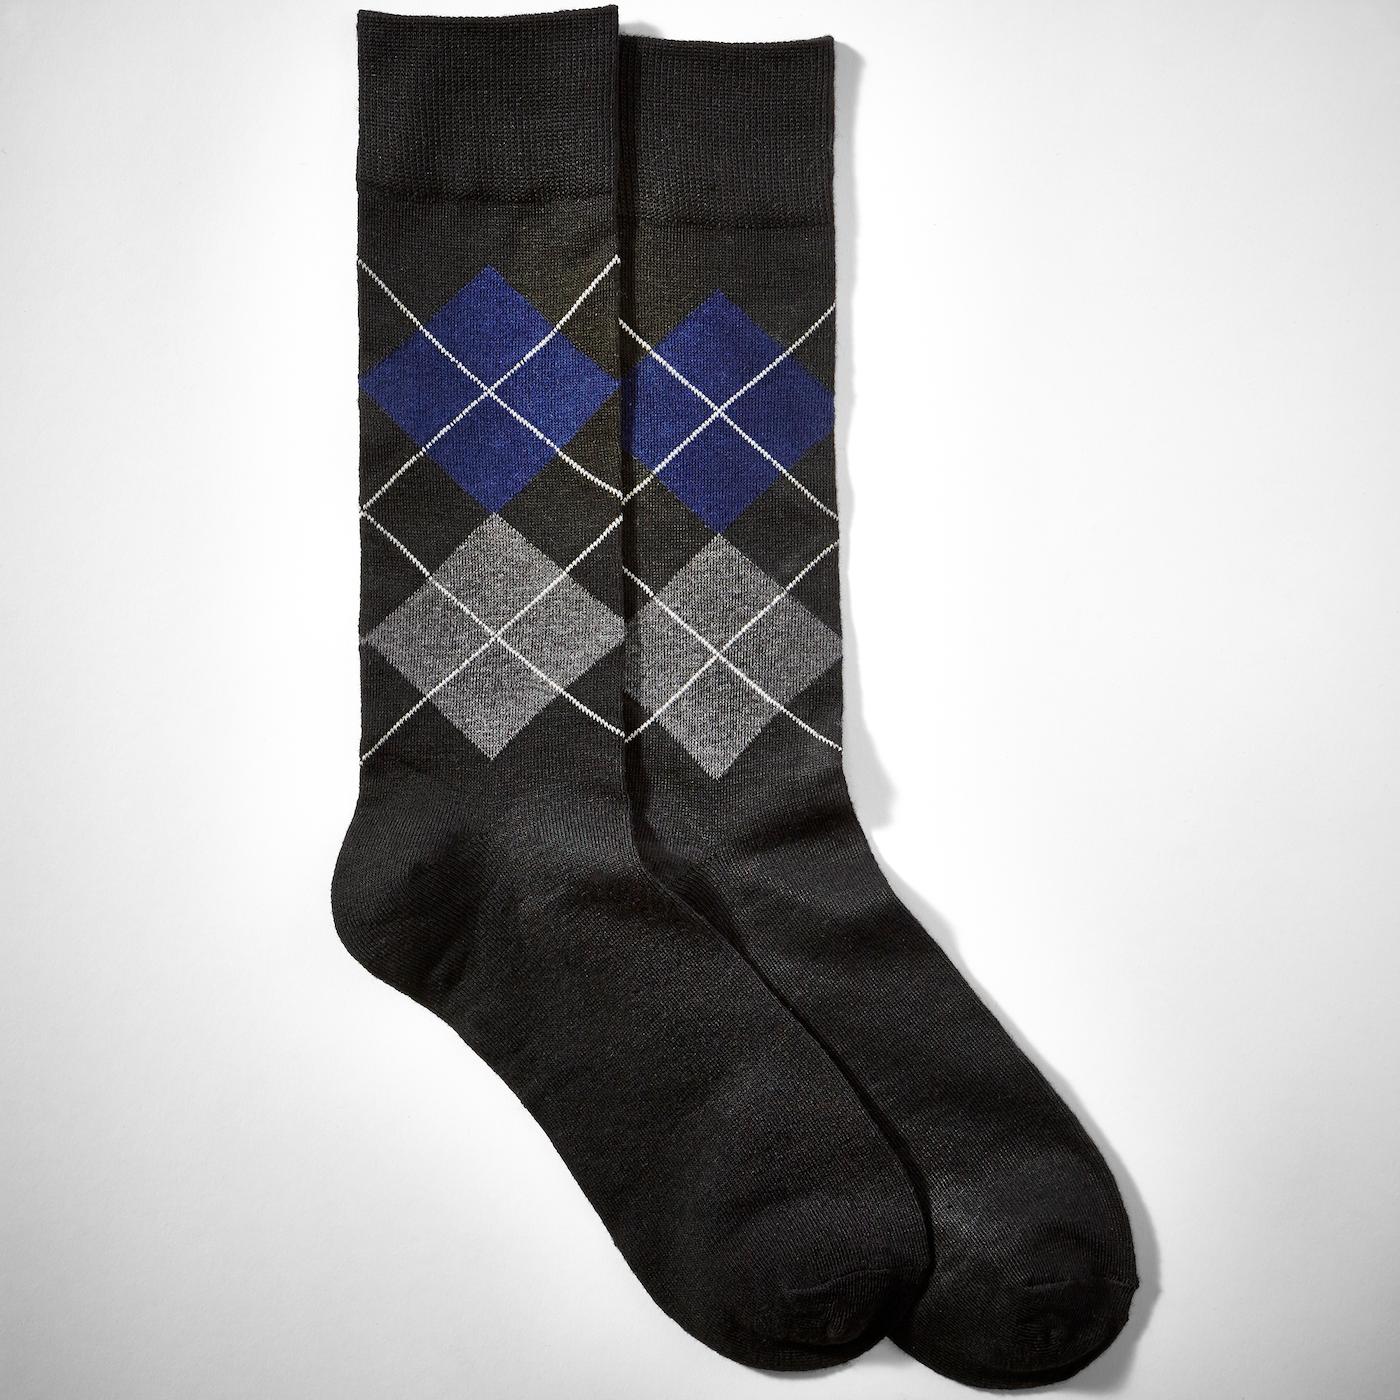 Blue Half Print Argyle Socks